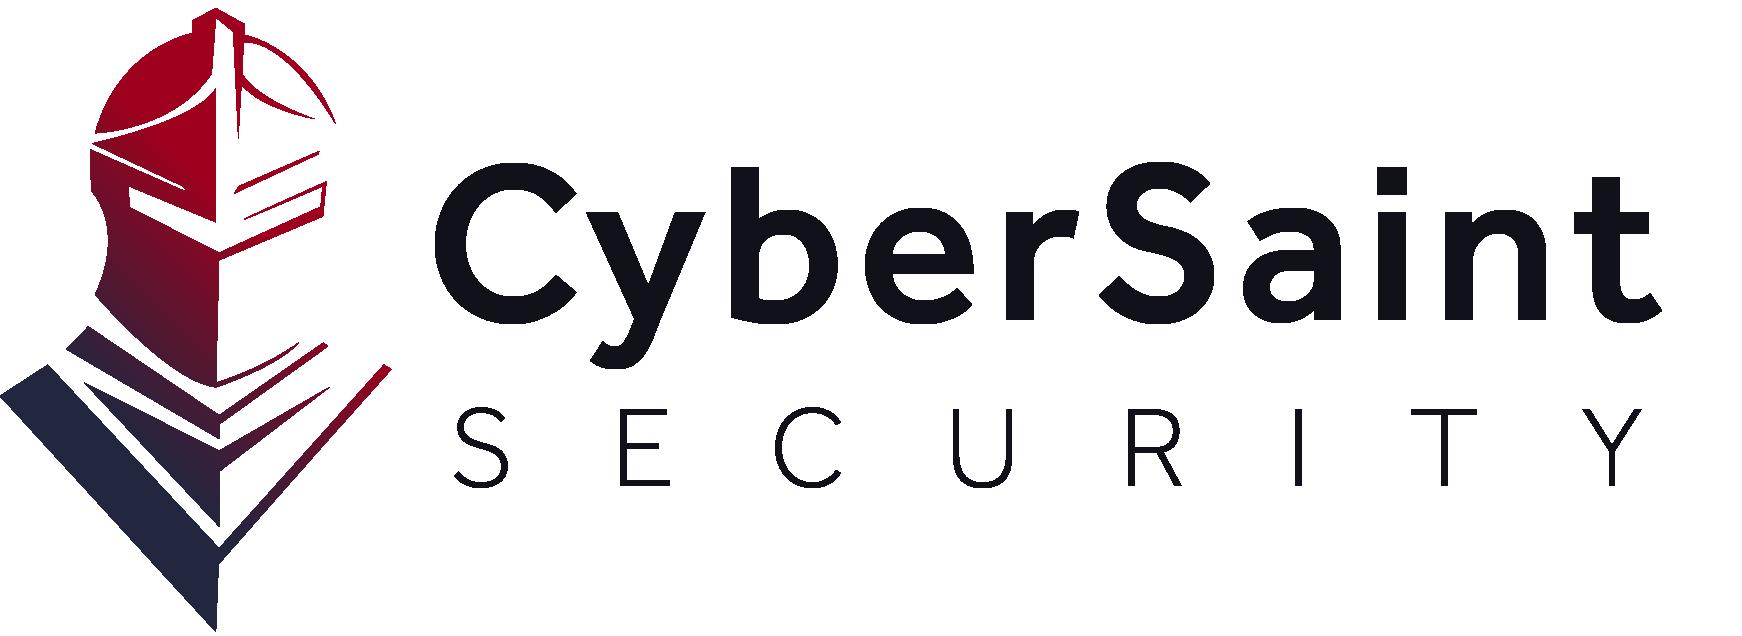 CyberSai